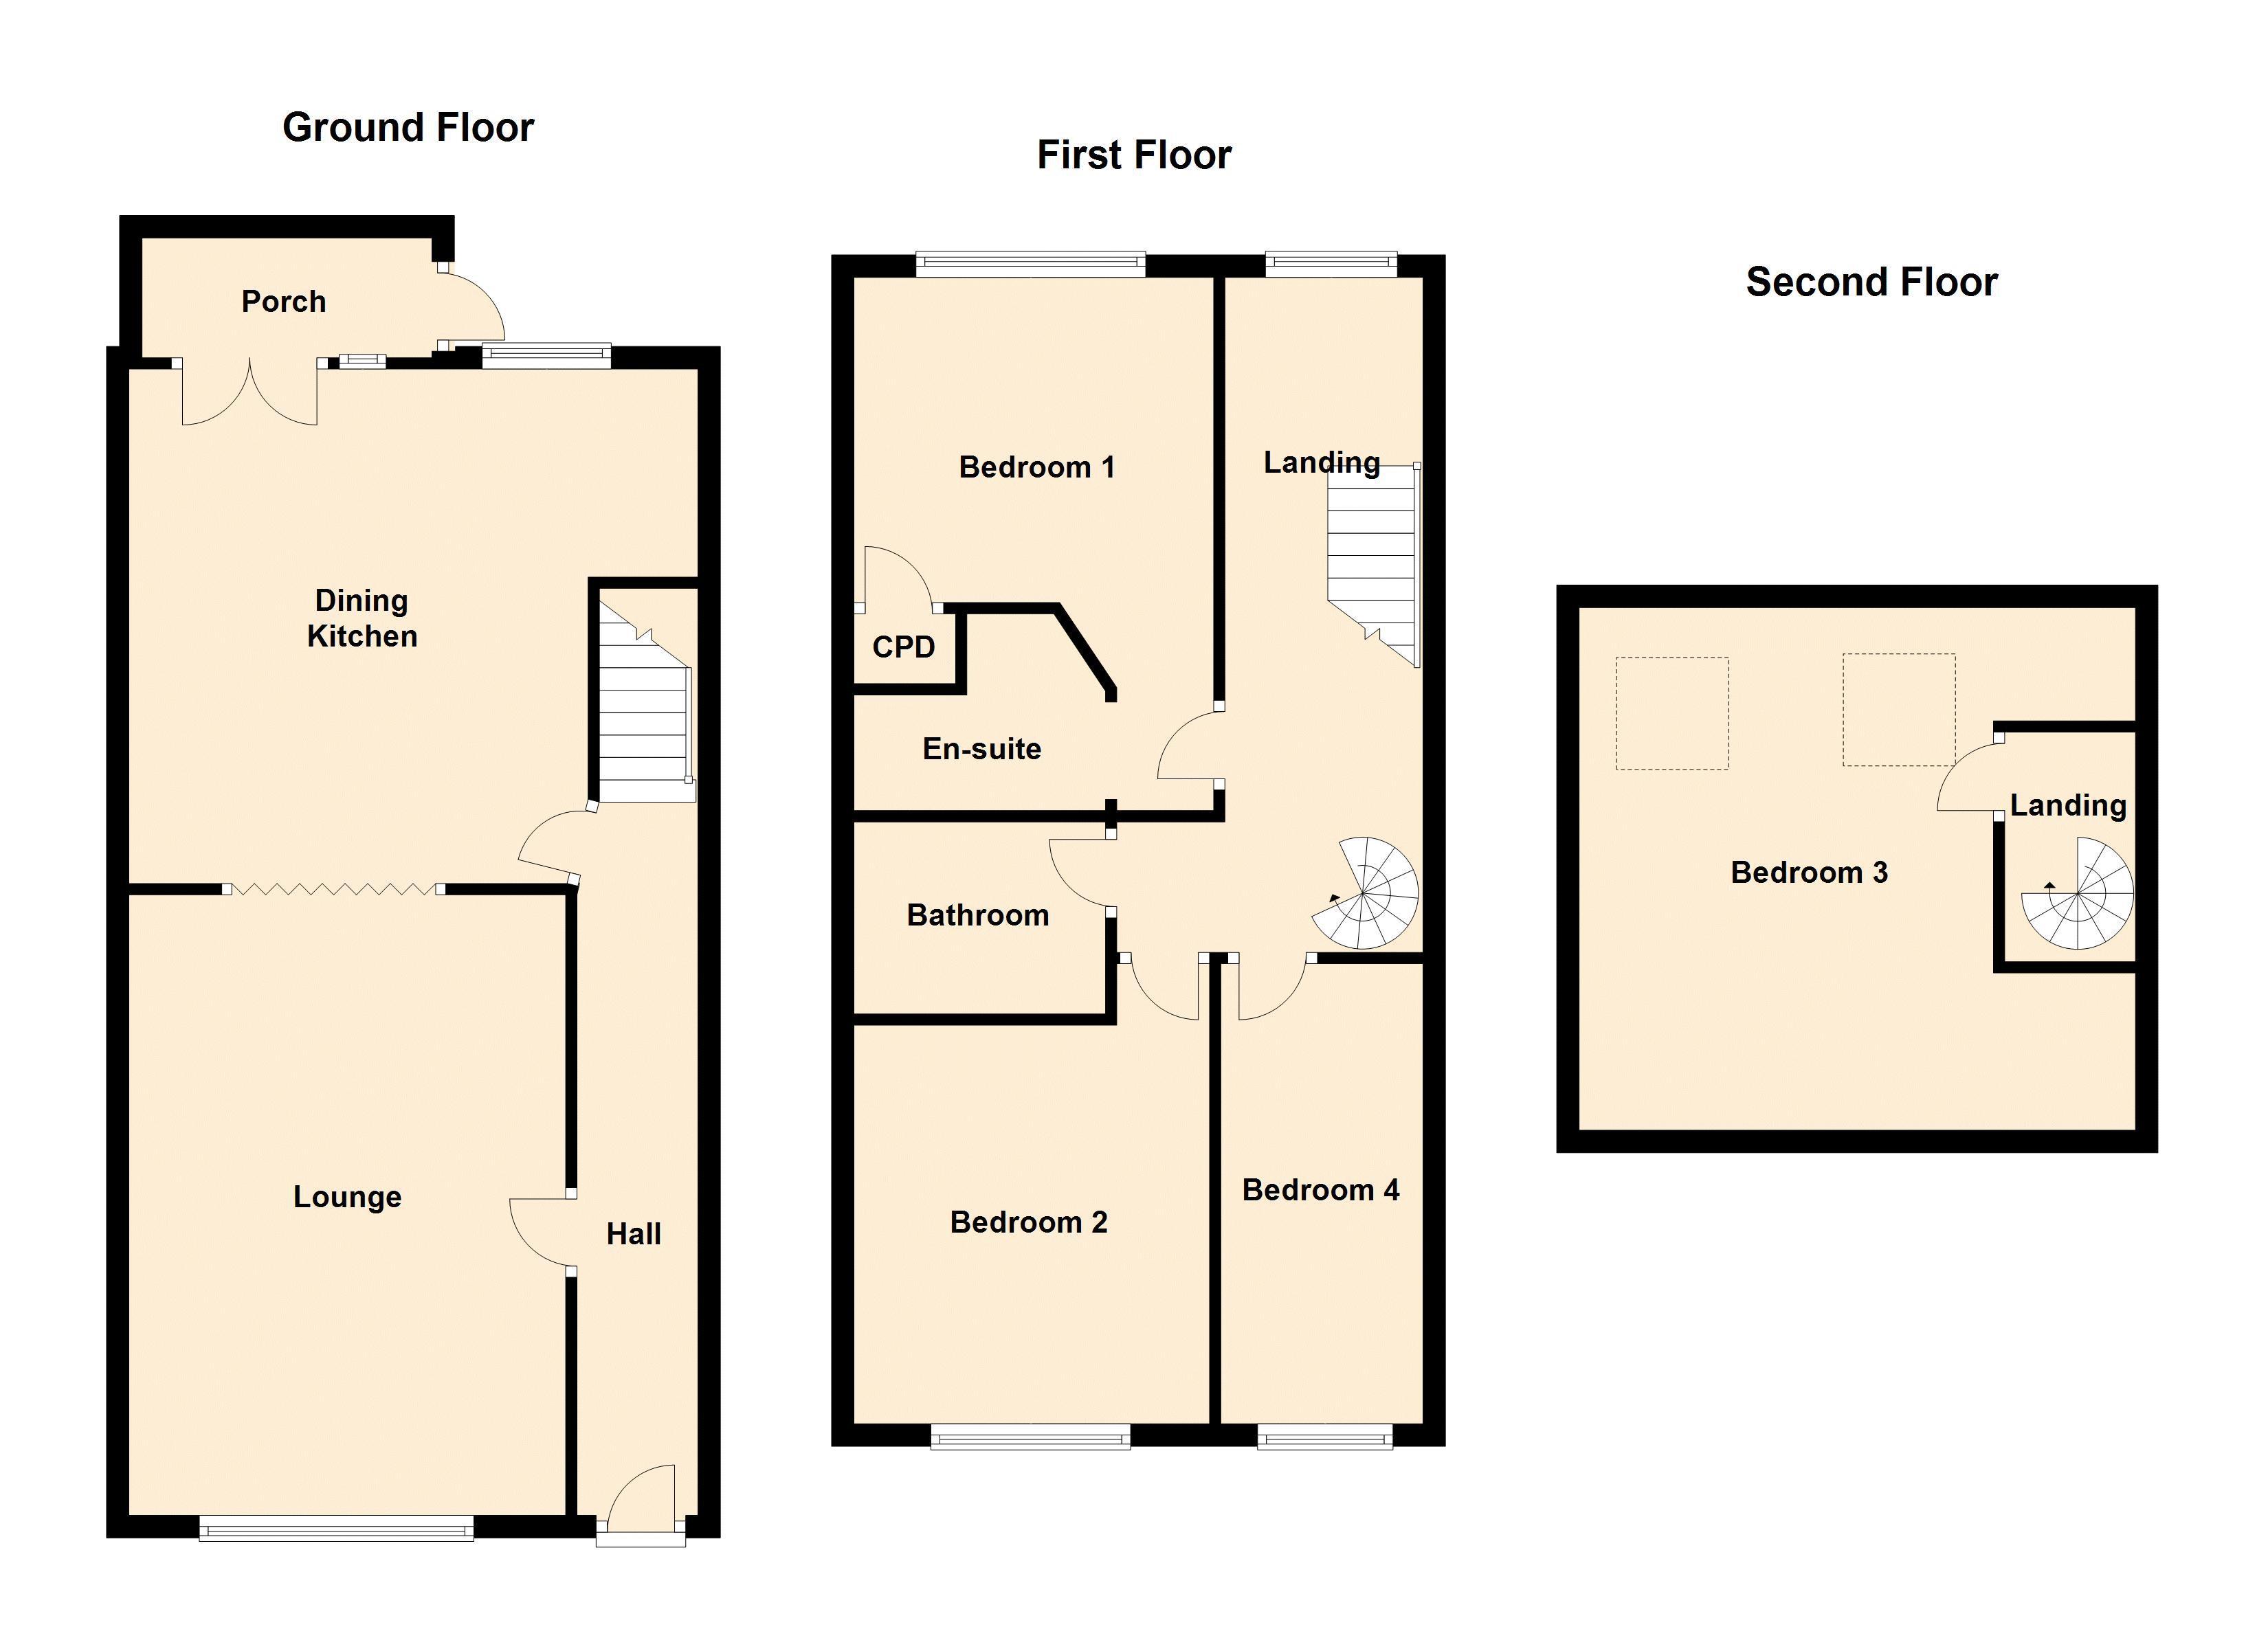 Ground / First Floors